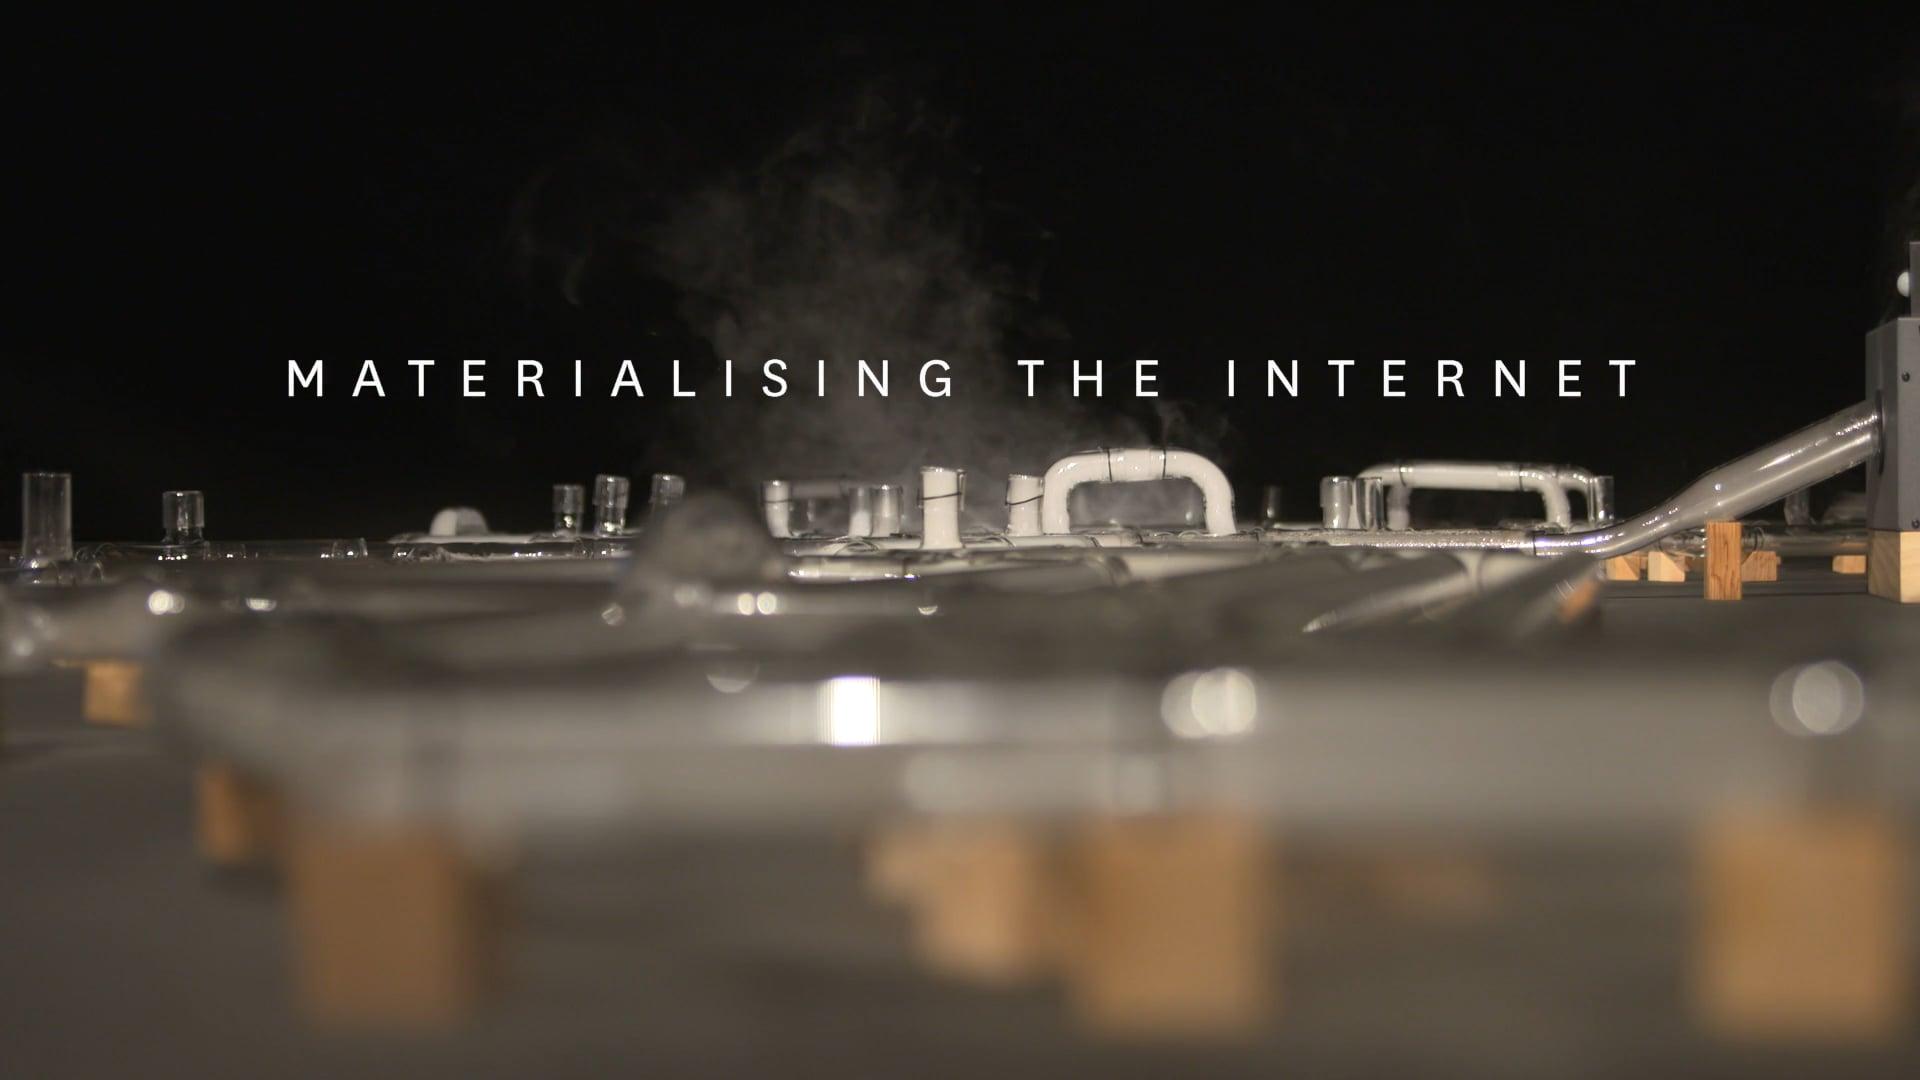 MU - Materialising the Internet